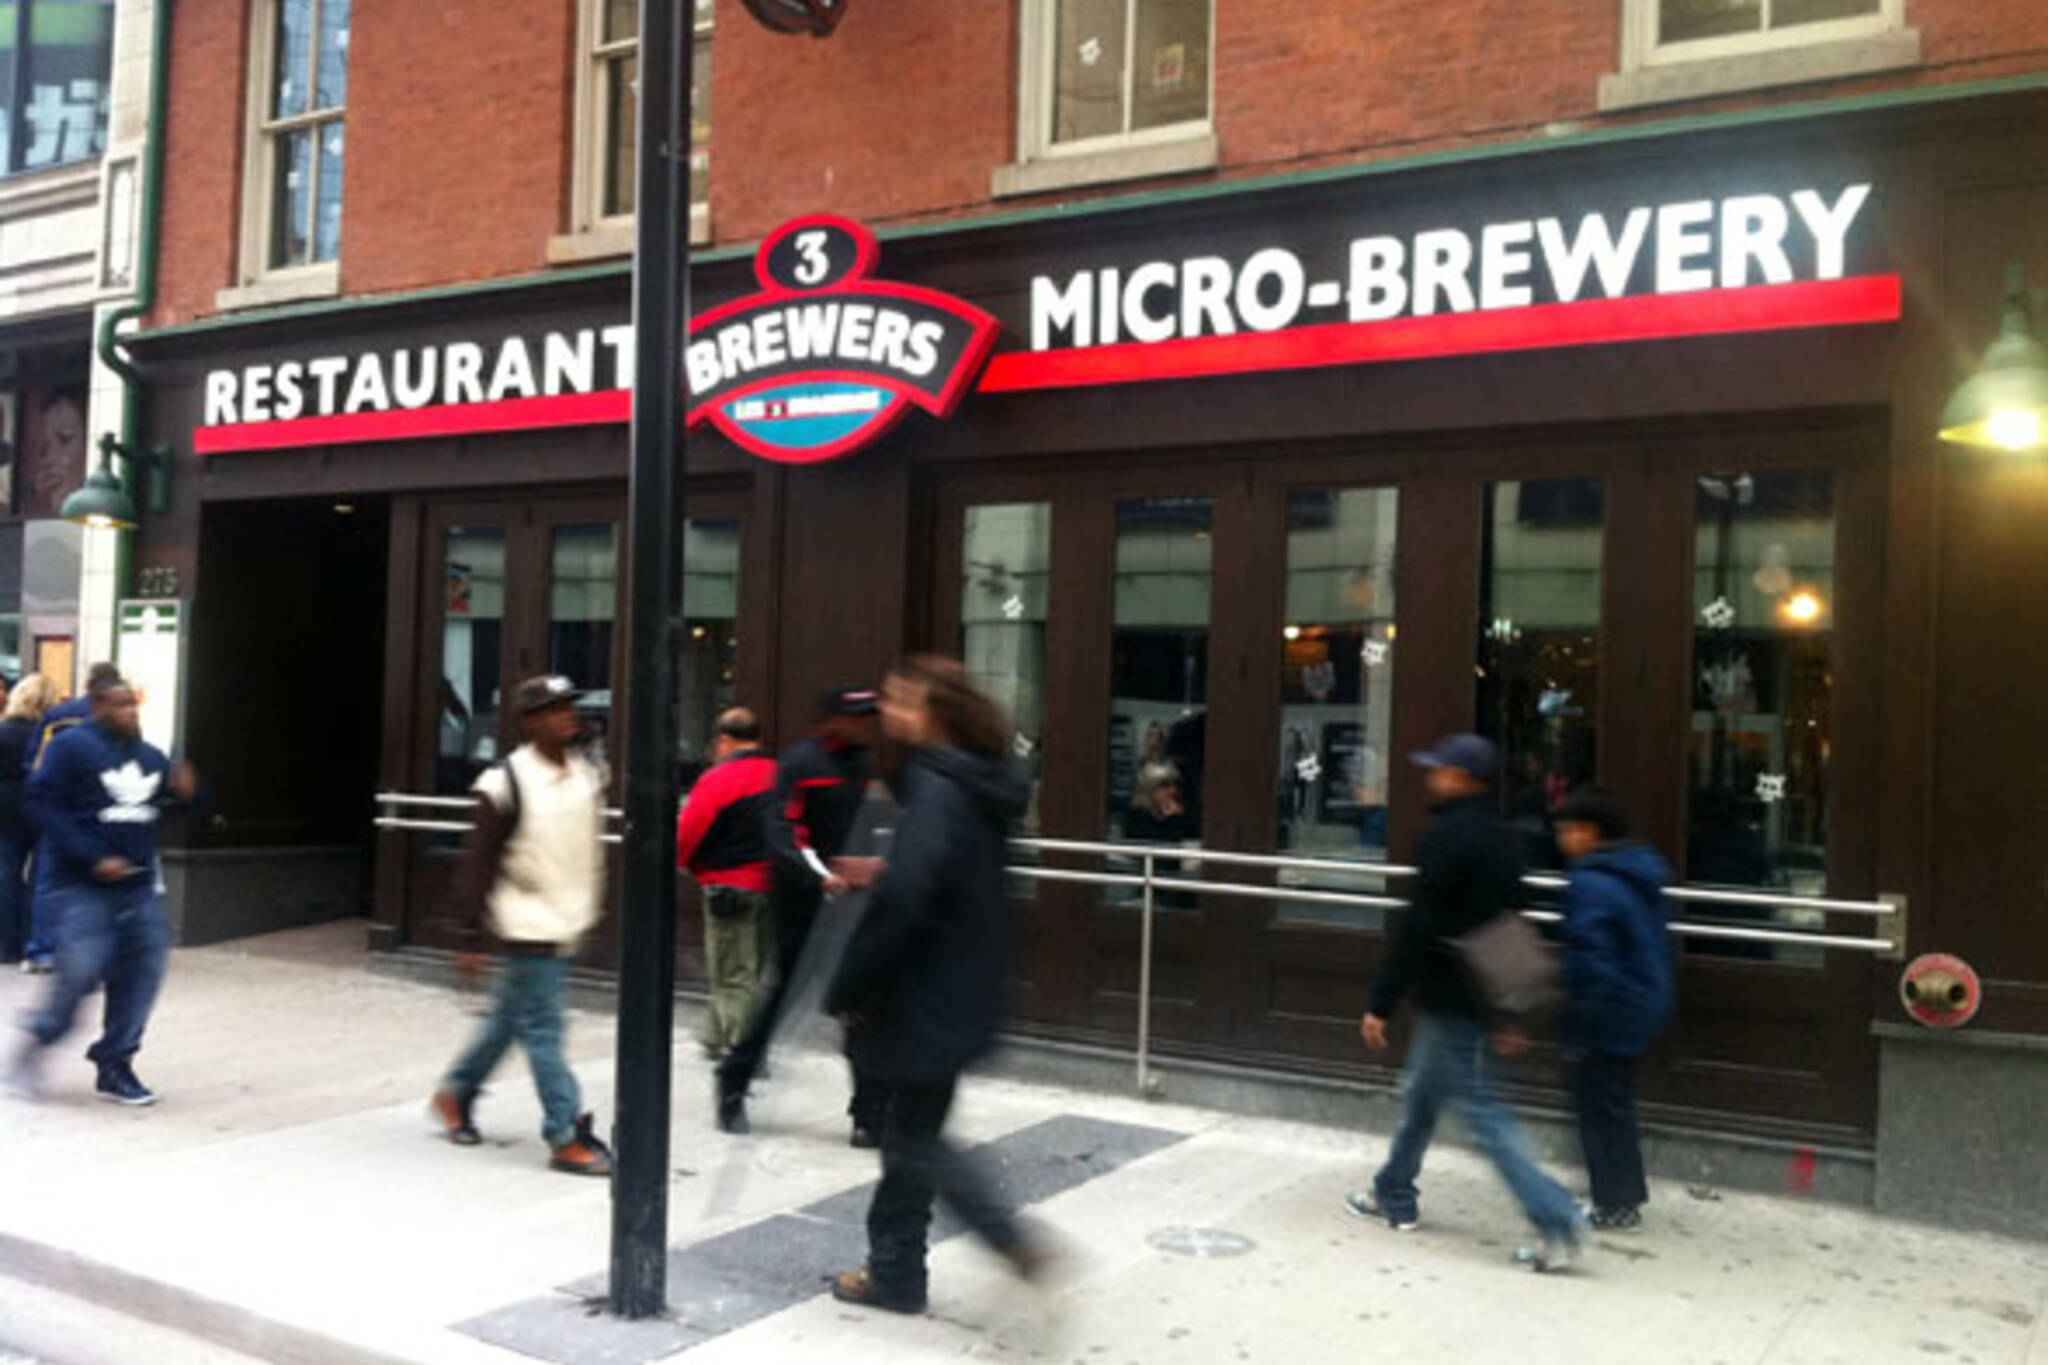 3 Brewers Toronto